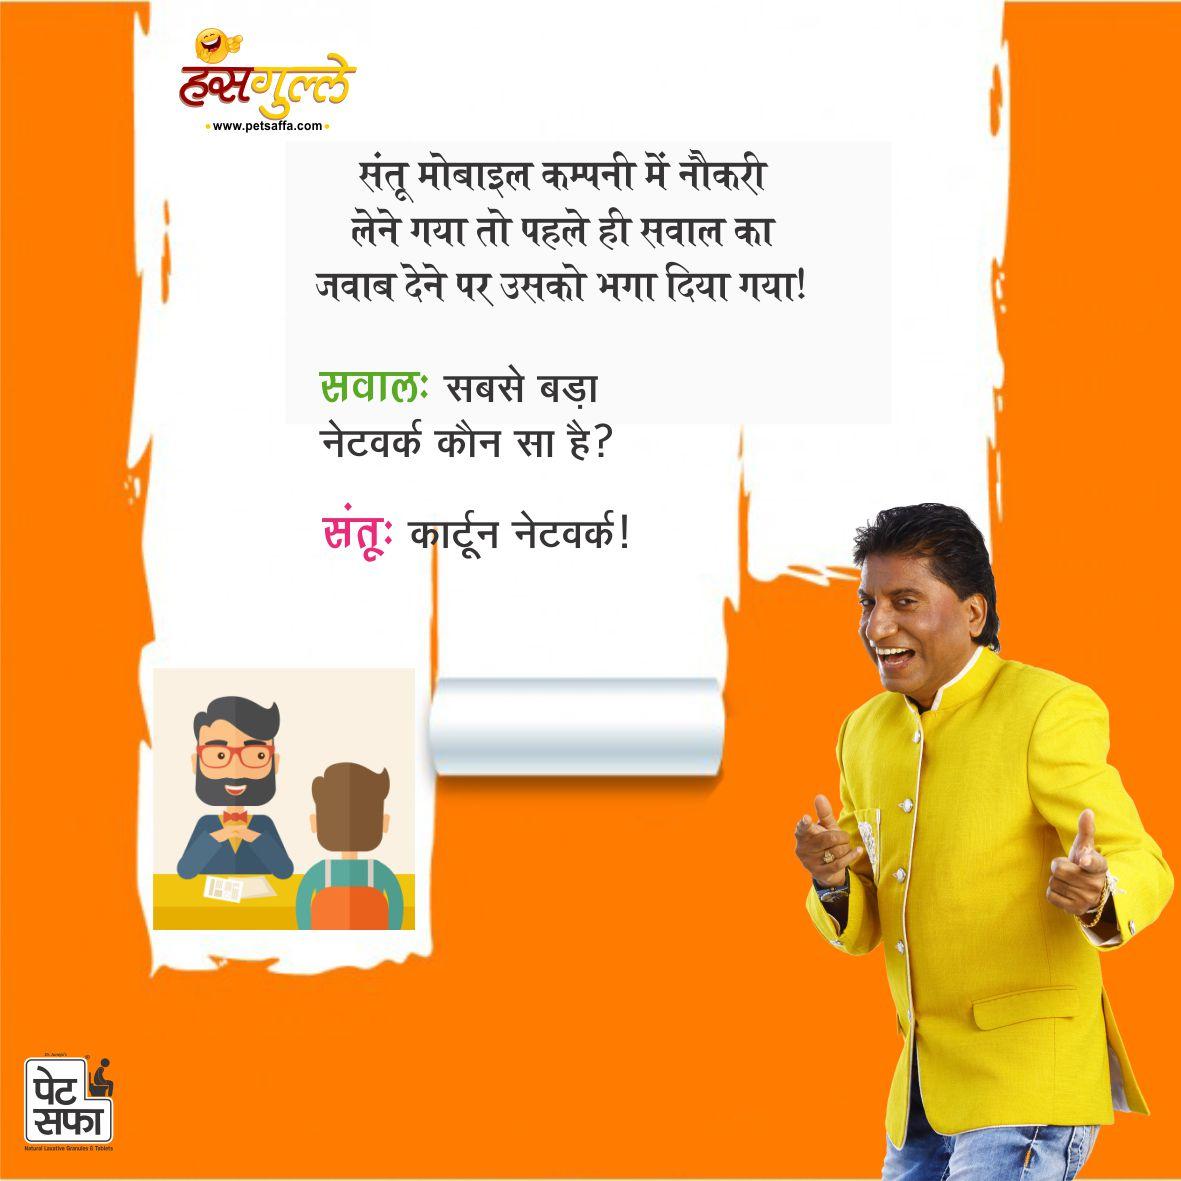 Hindi Jokes Unlimited - Google